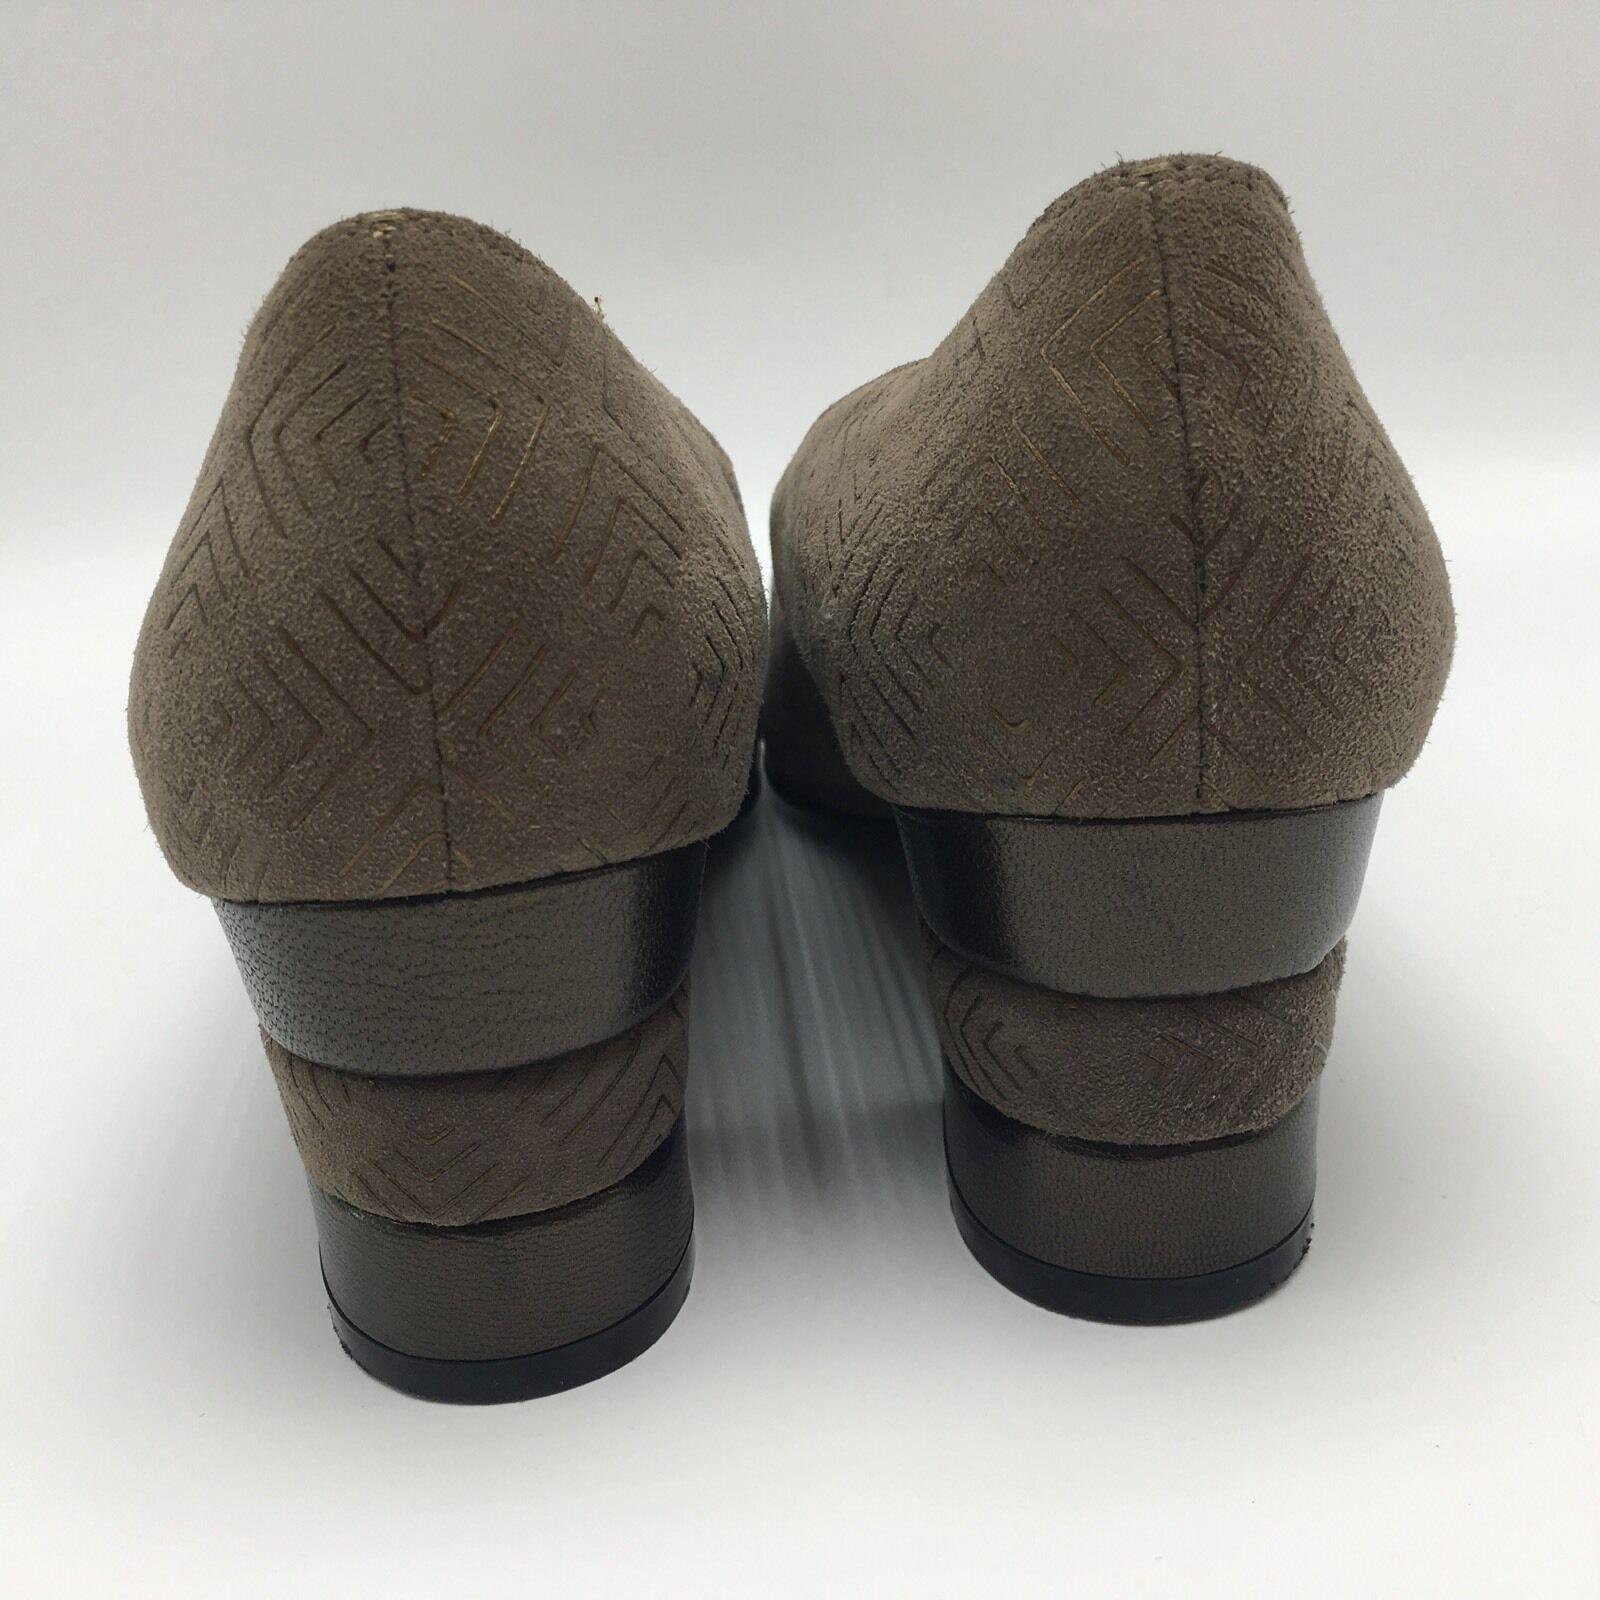 Salvatore Ferragamo  Suede Leder Light 6.5 Braun Bronze Classic Heels 6.5 Light B db517d